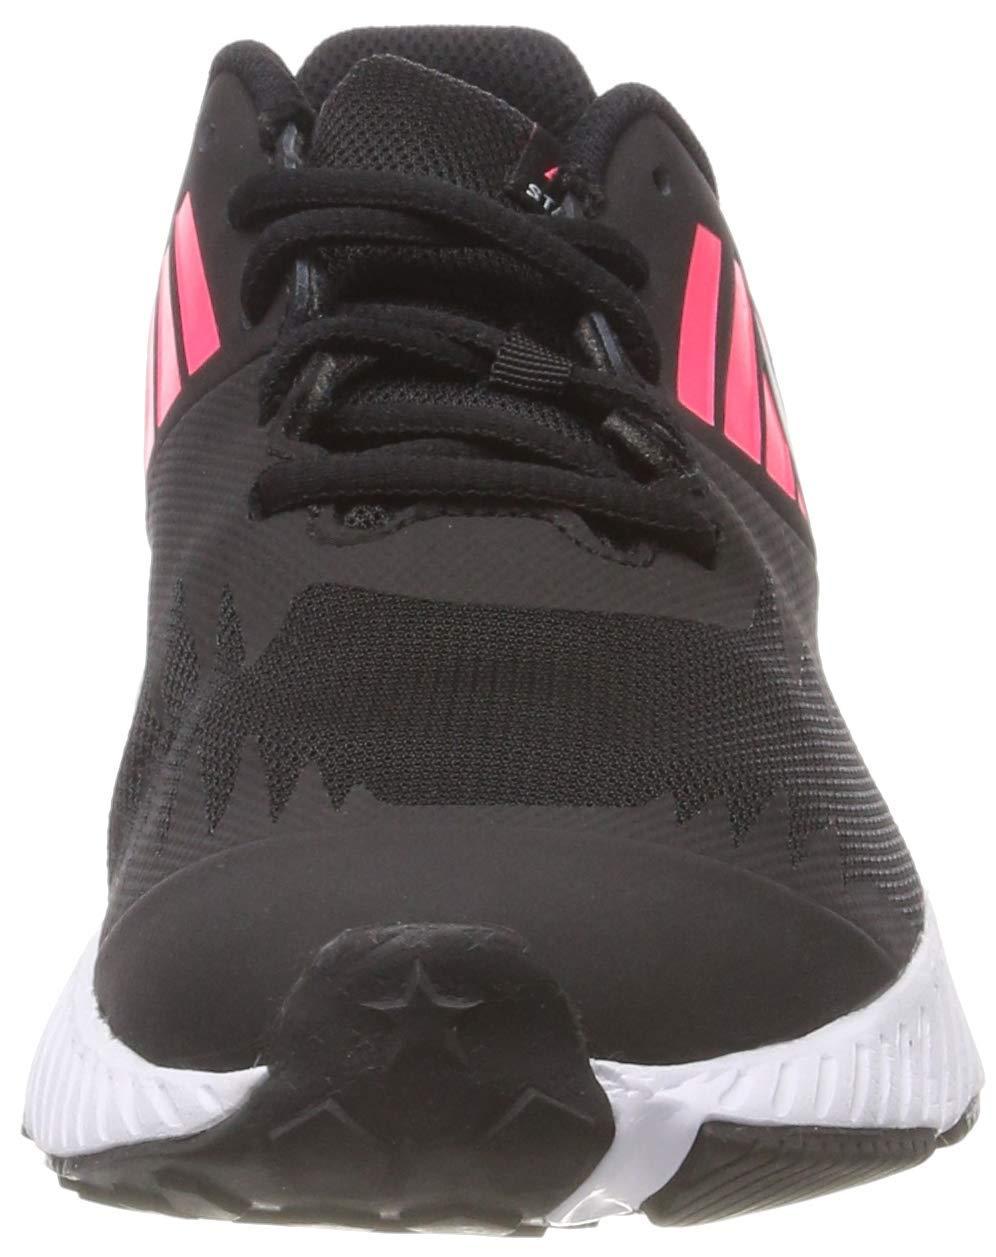 Nike Girl's Star Runner (GS) Running Shoe Black/Metallic Silver/Racer Pink/Volt Size 3.5 M US by Nike (Image #3)